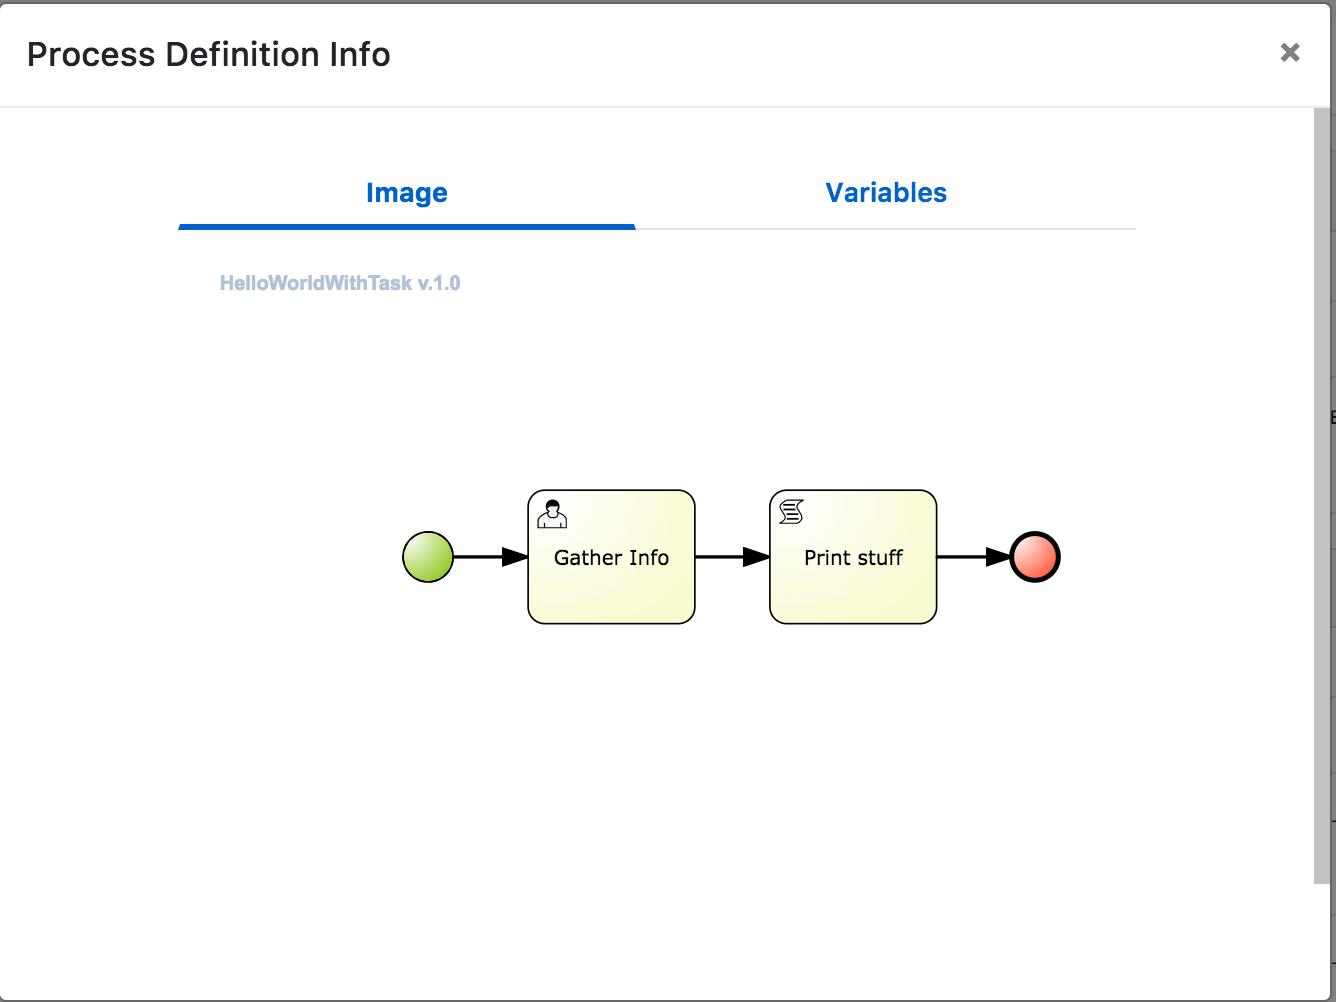 Process Def Image